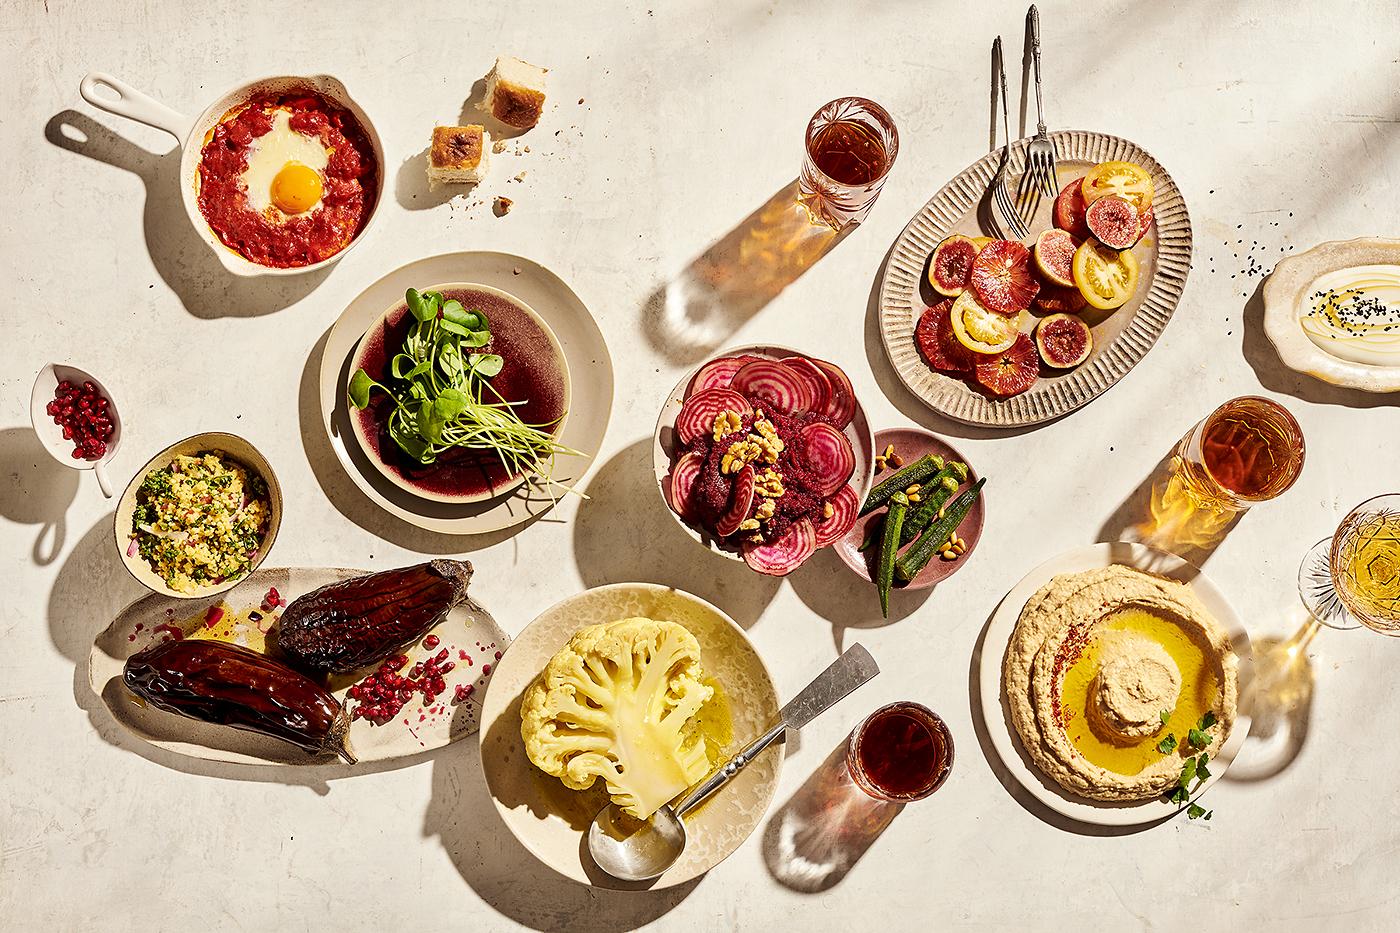 Beratung und Coaching Foodfotograf Oliver Hauser